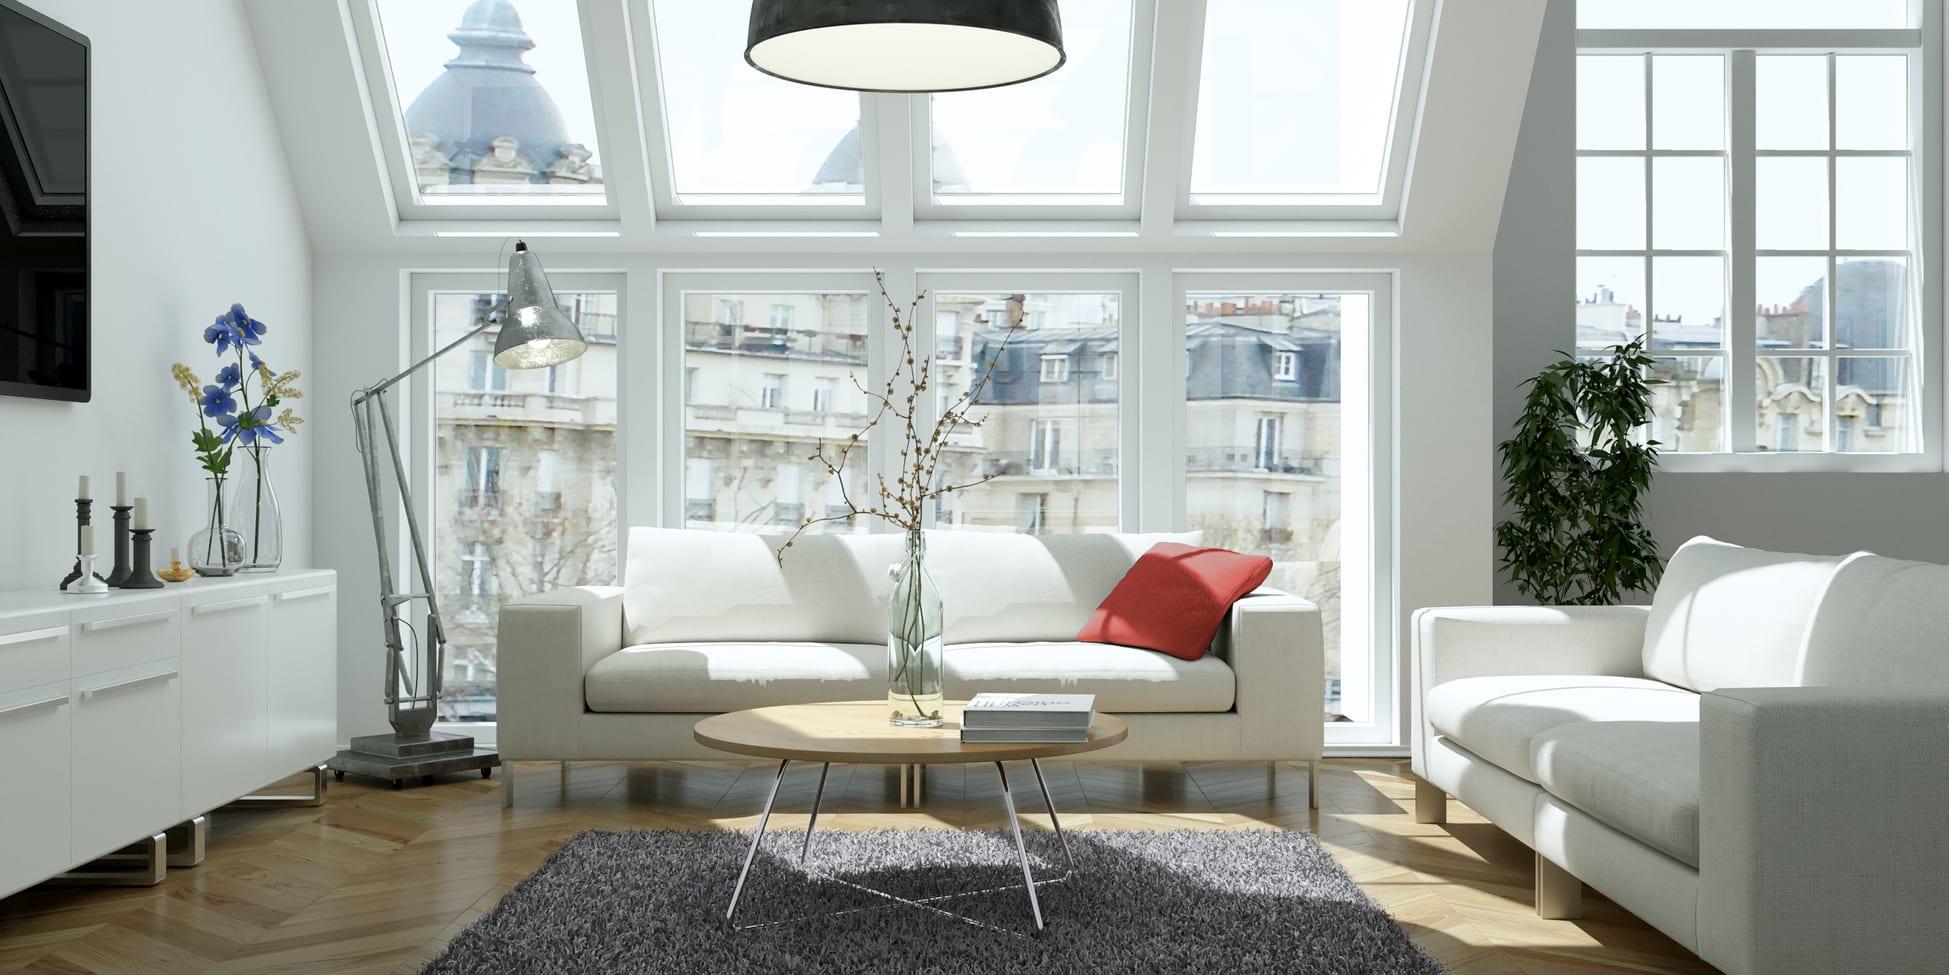 Chasseur immobilier Paris  FLAT HUNTER Chasseur dappartement